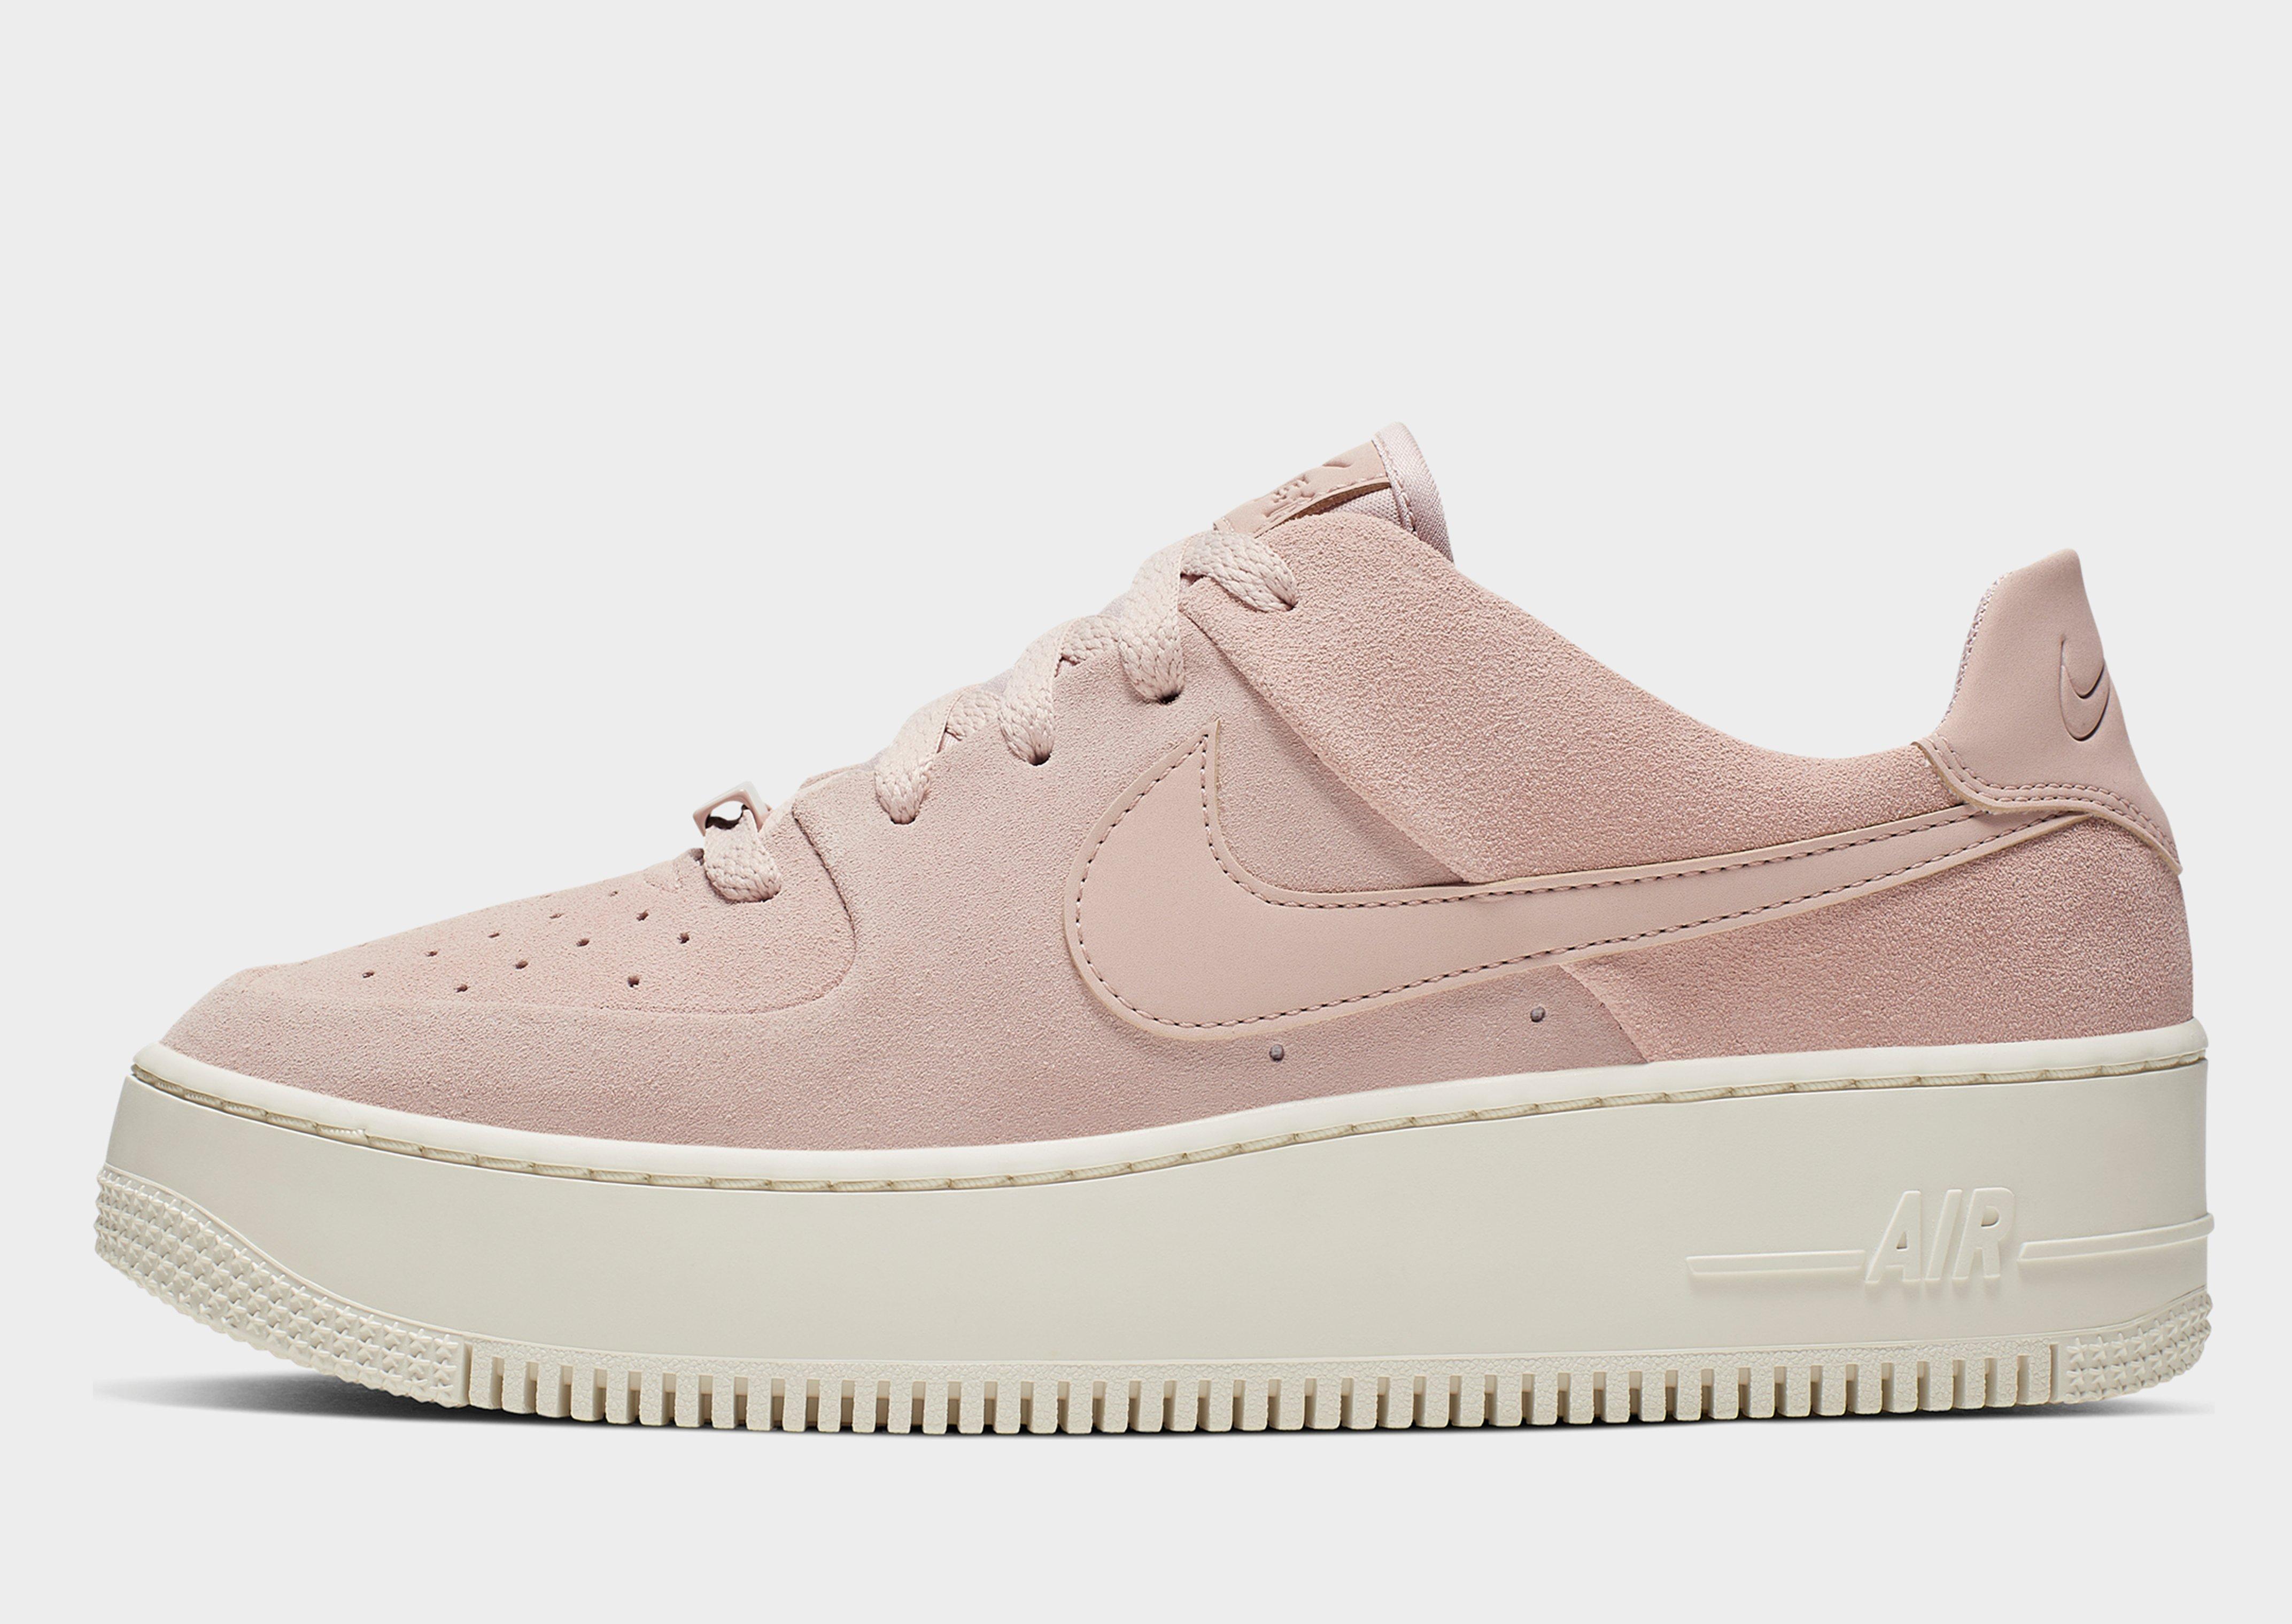 ecc9acf4fba4aa Nike Air Force 1 Sage Low Women's | JD Sports